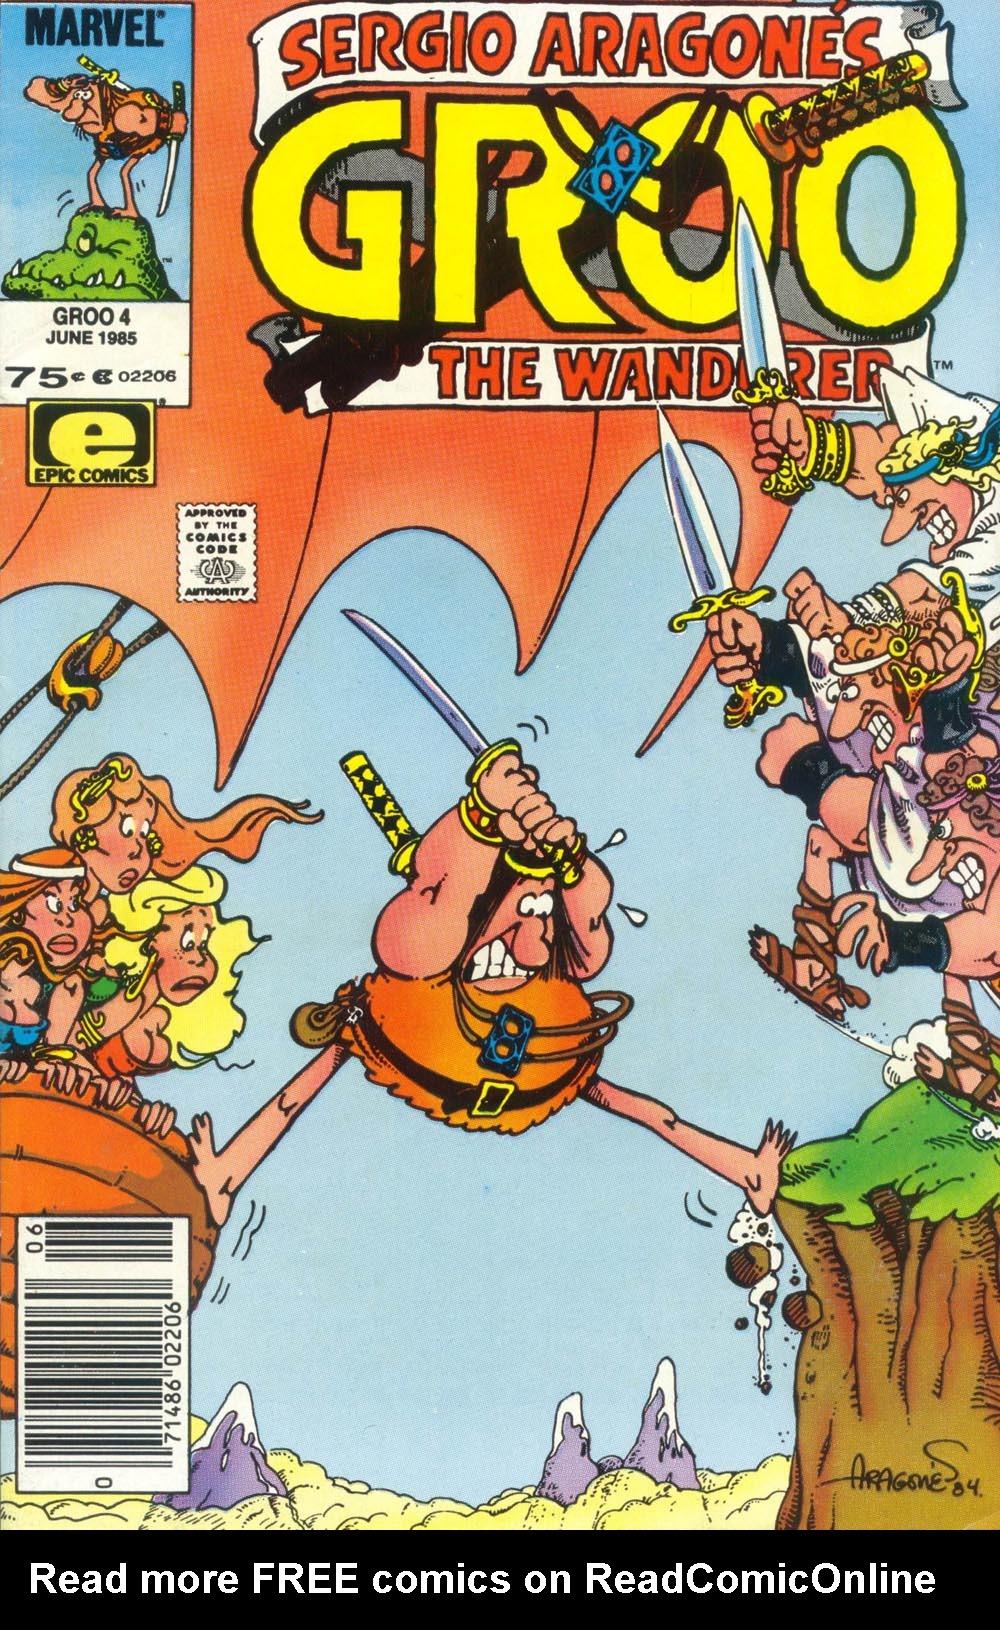 Read online Sergio Aragonés Groo the Wanderer comic -  Issue #4 - 1